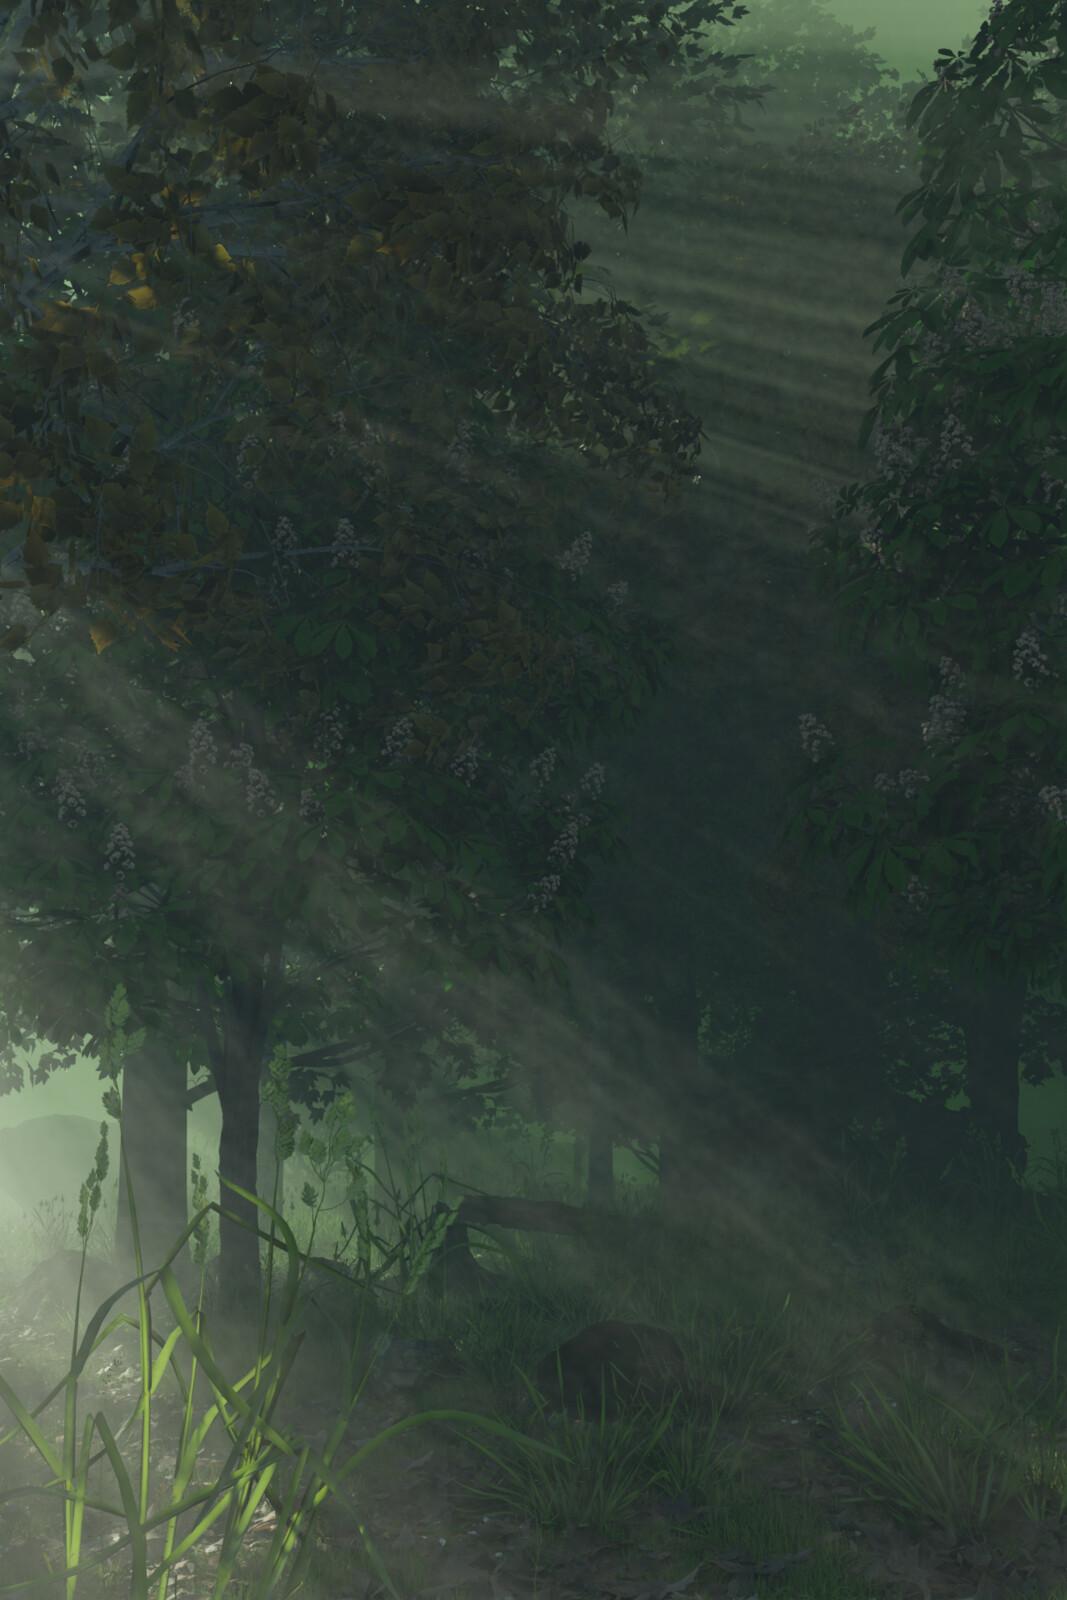 Forest raw render in Blender